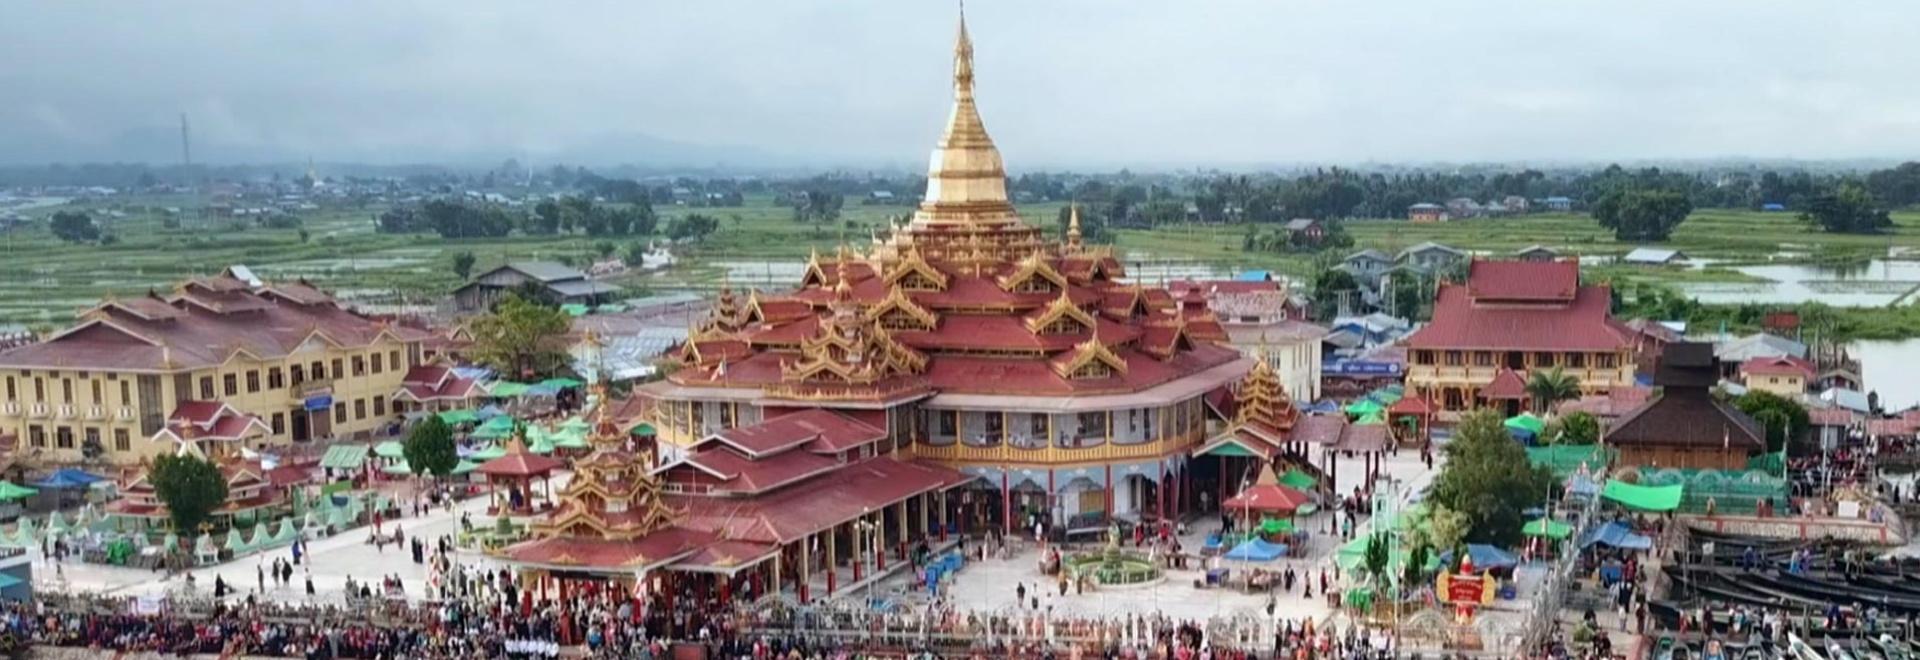 In una palafitta sul lago - Myanmar